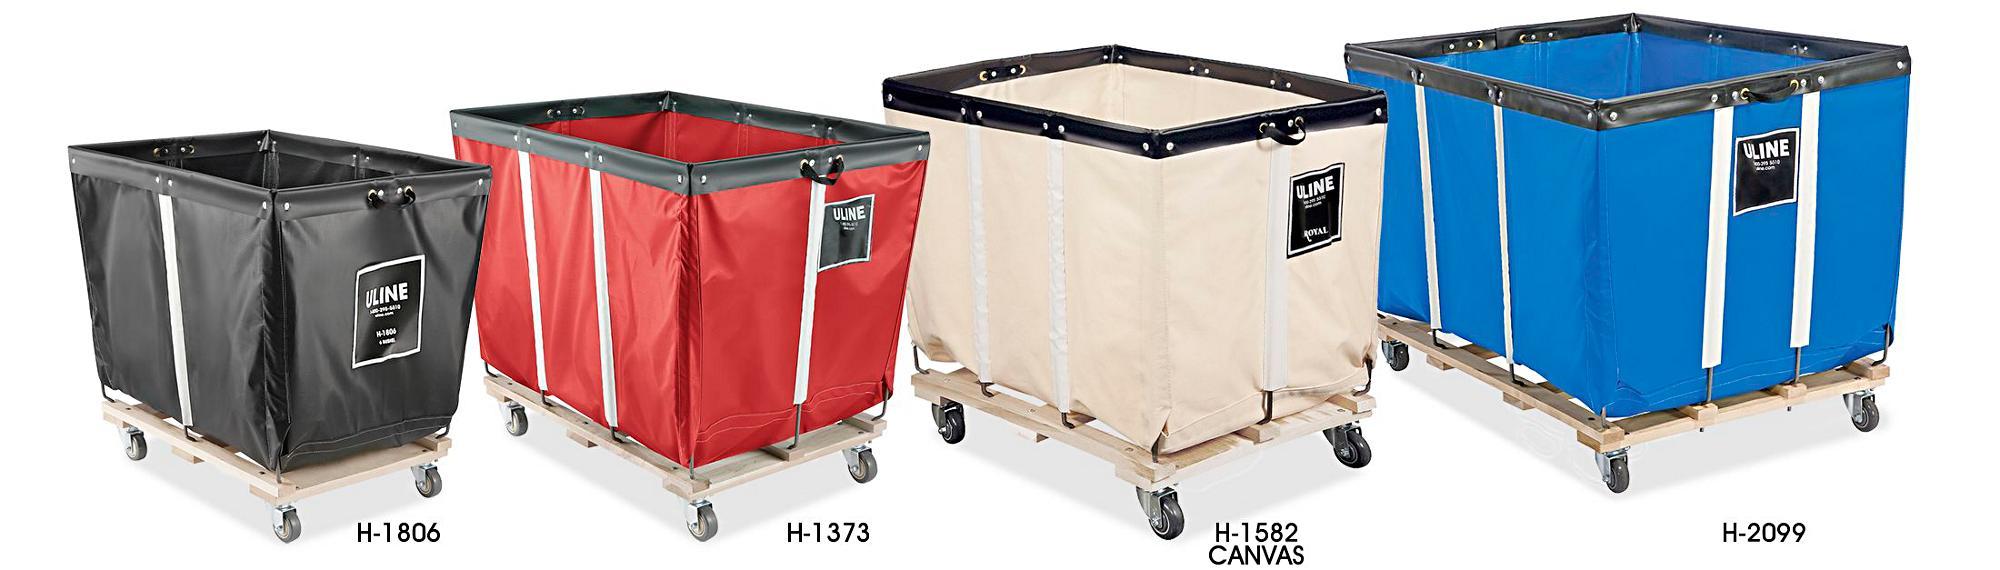 Basket Trucks